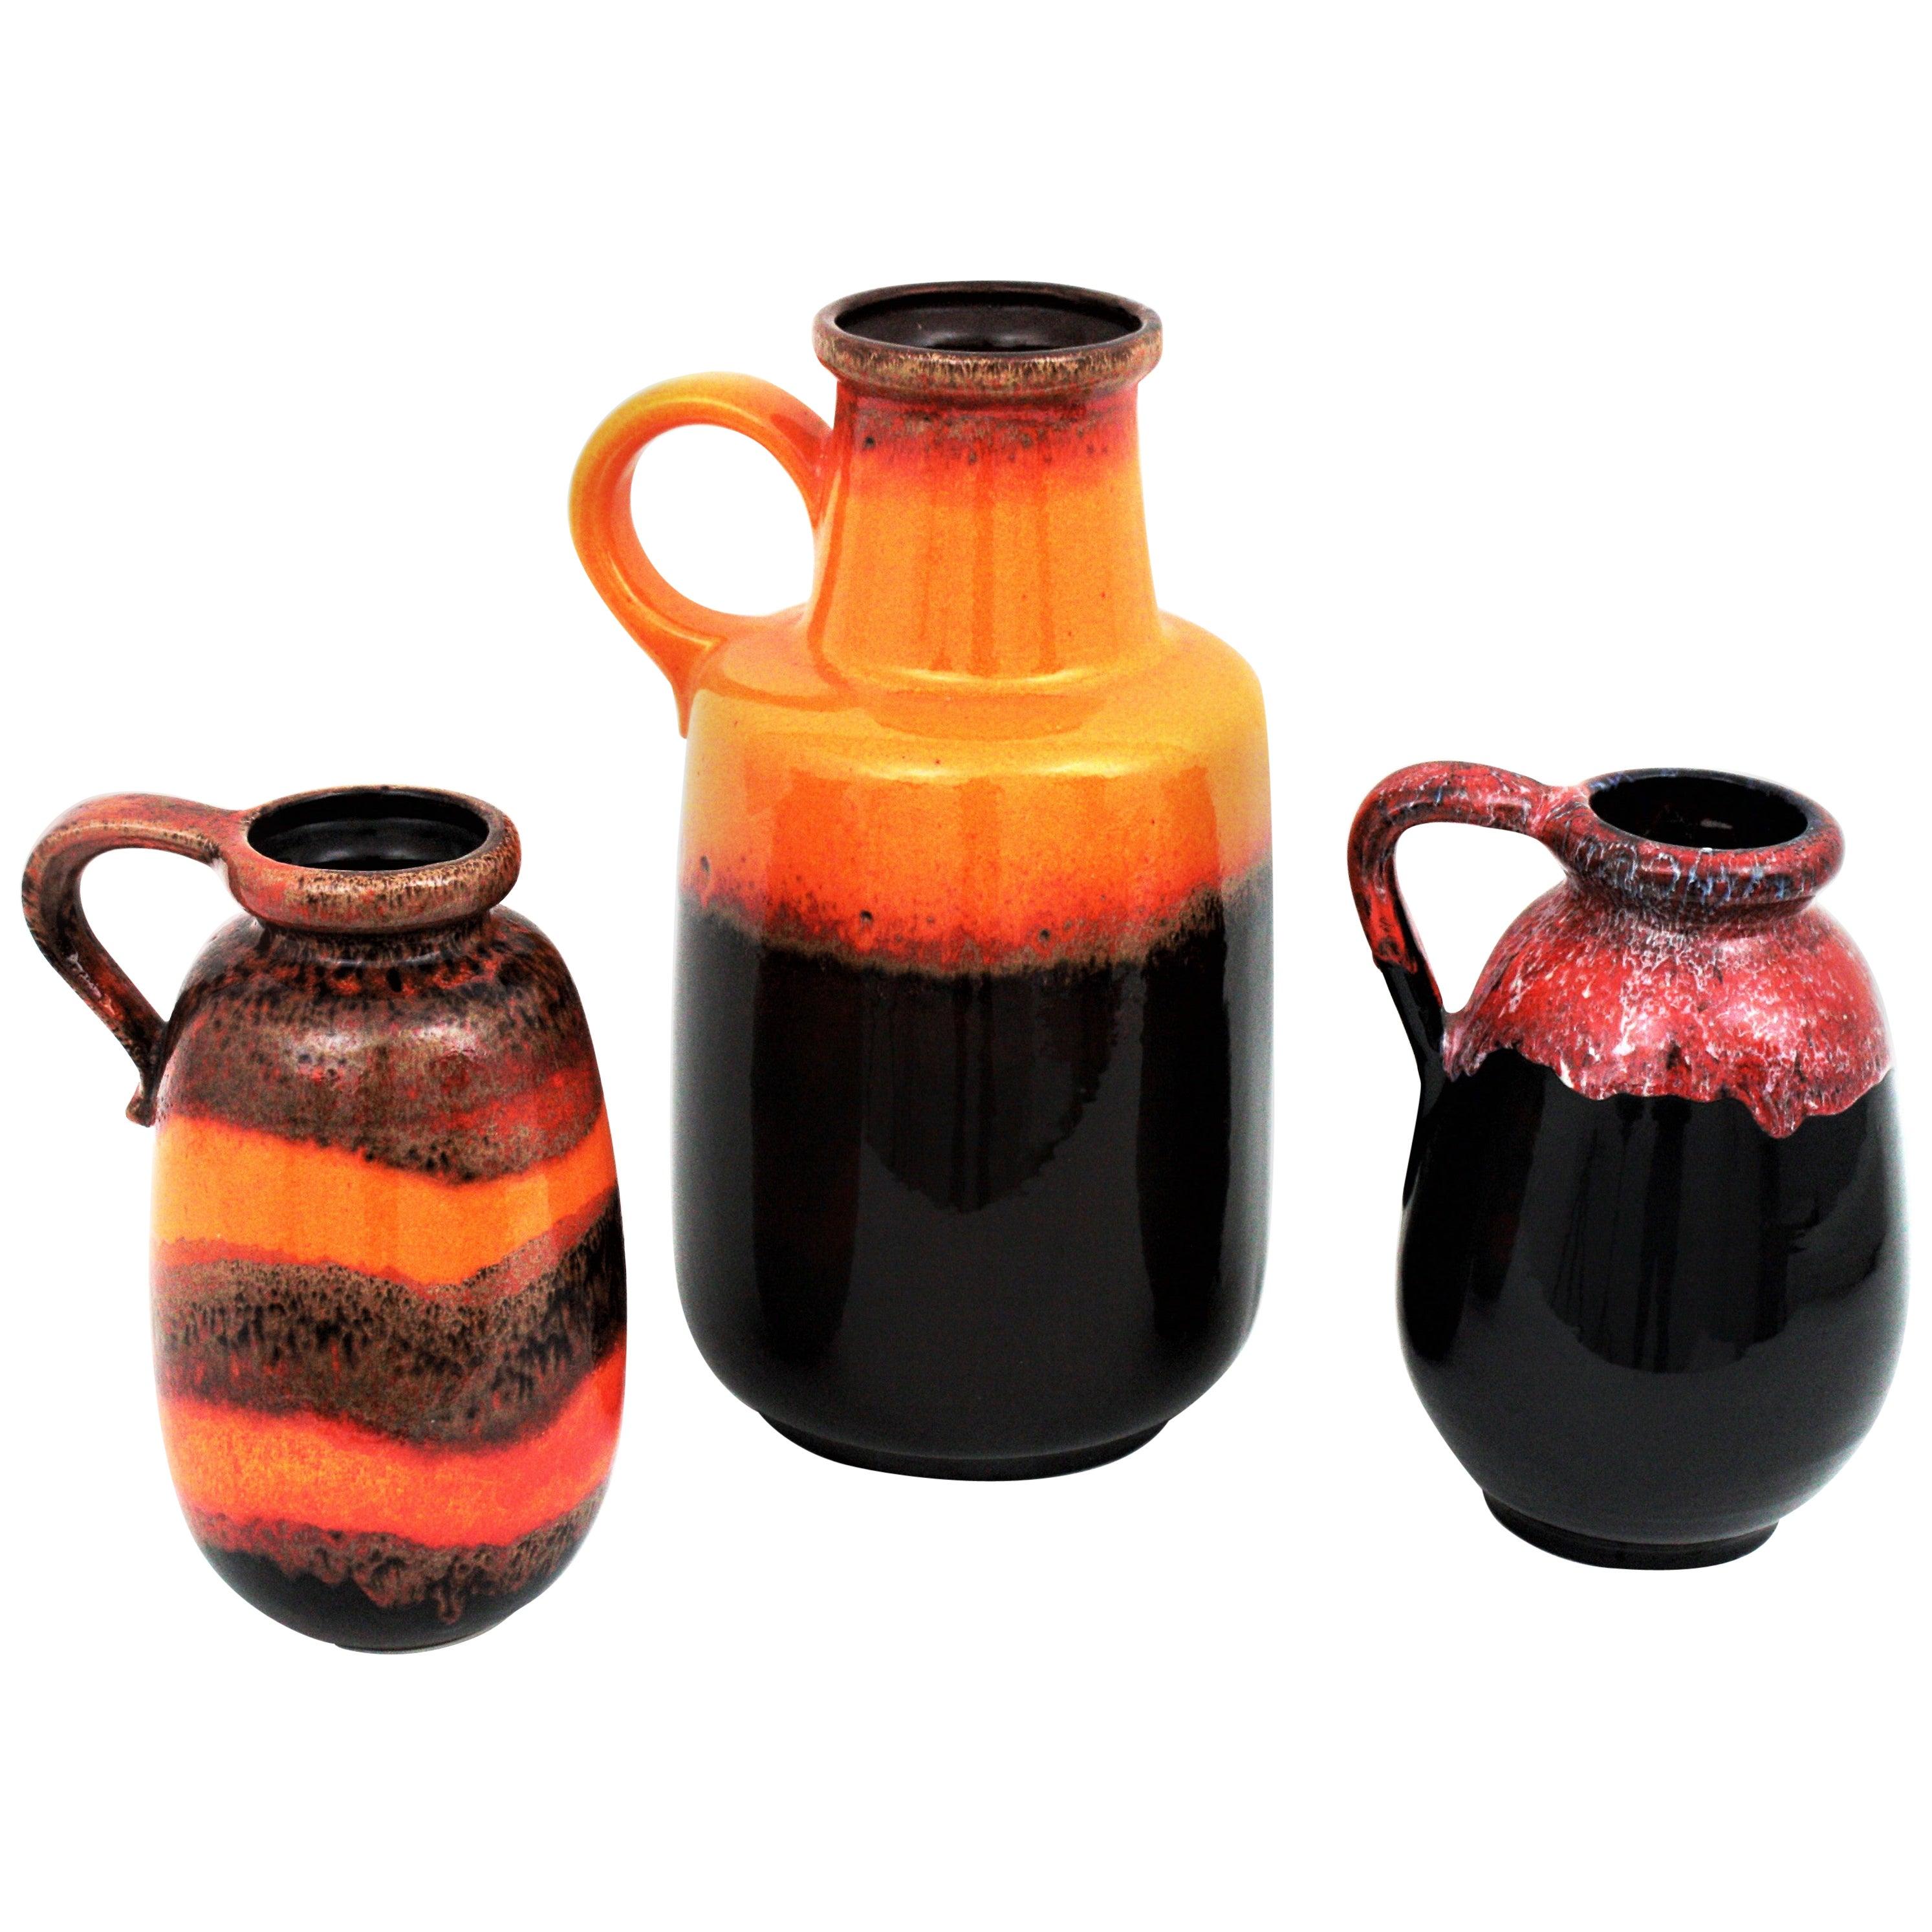 Set of Three West German Scheurich Keramik Fat Lava Glazed Ceramic Vases / Jars